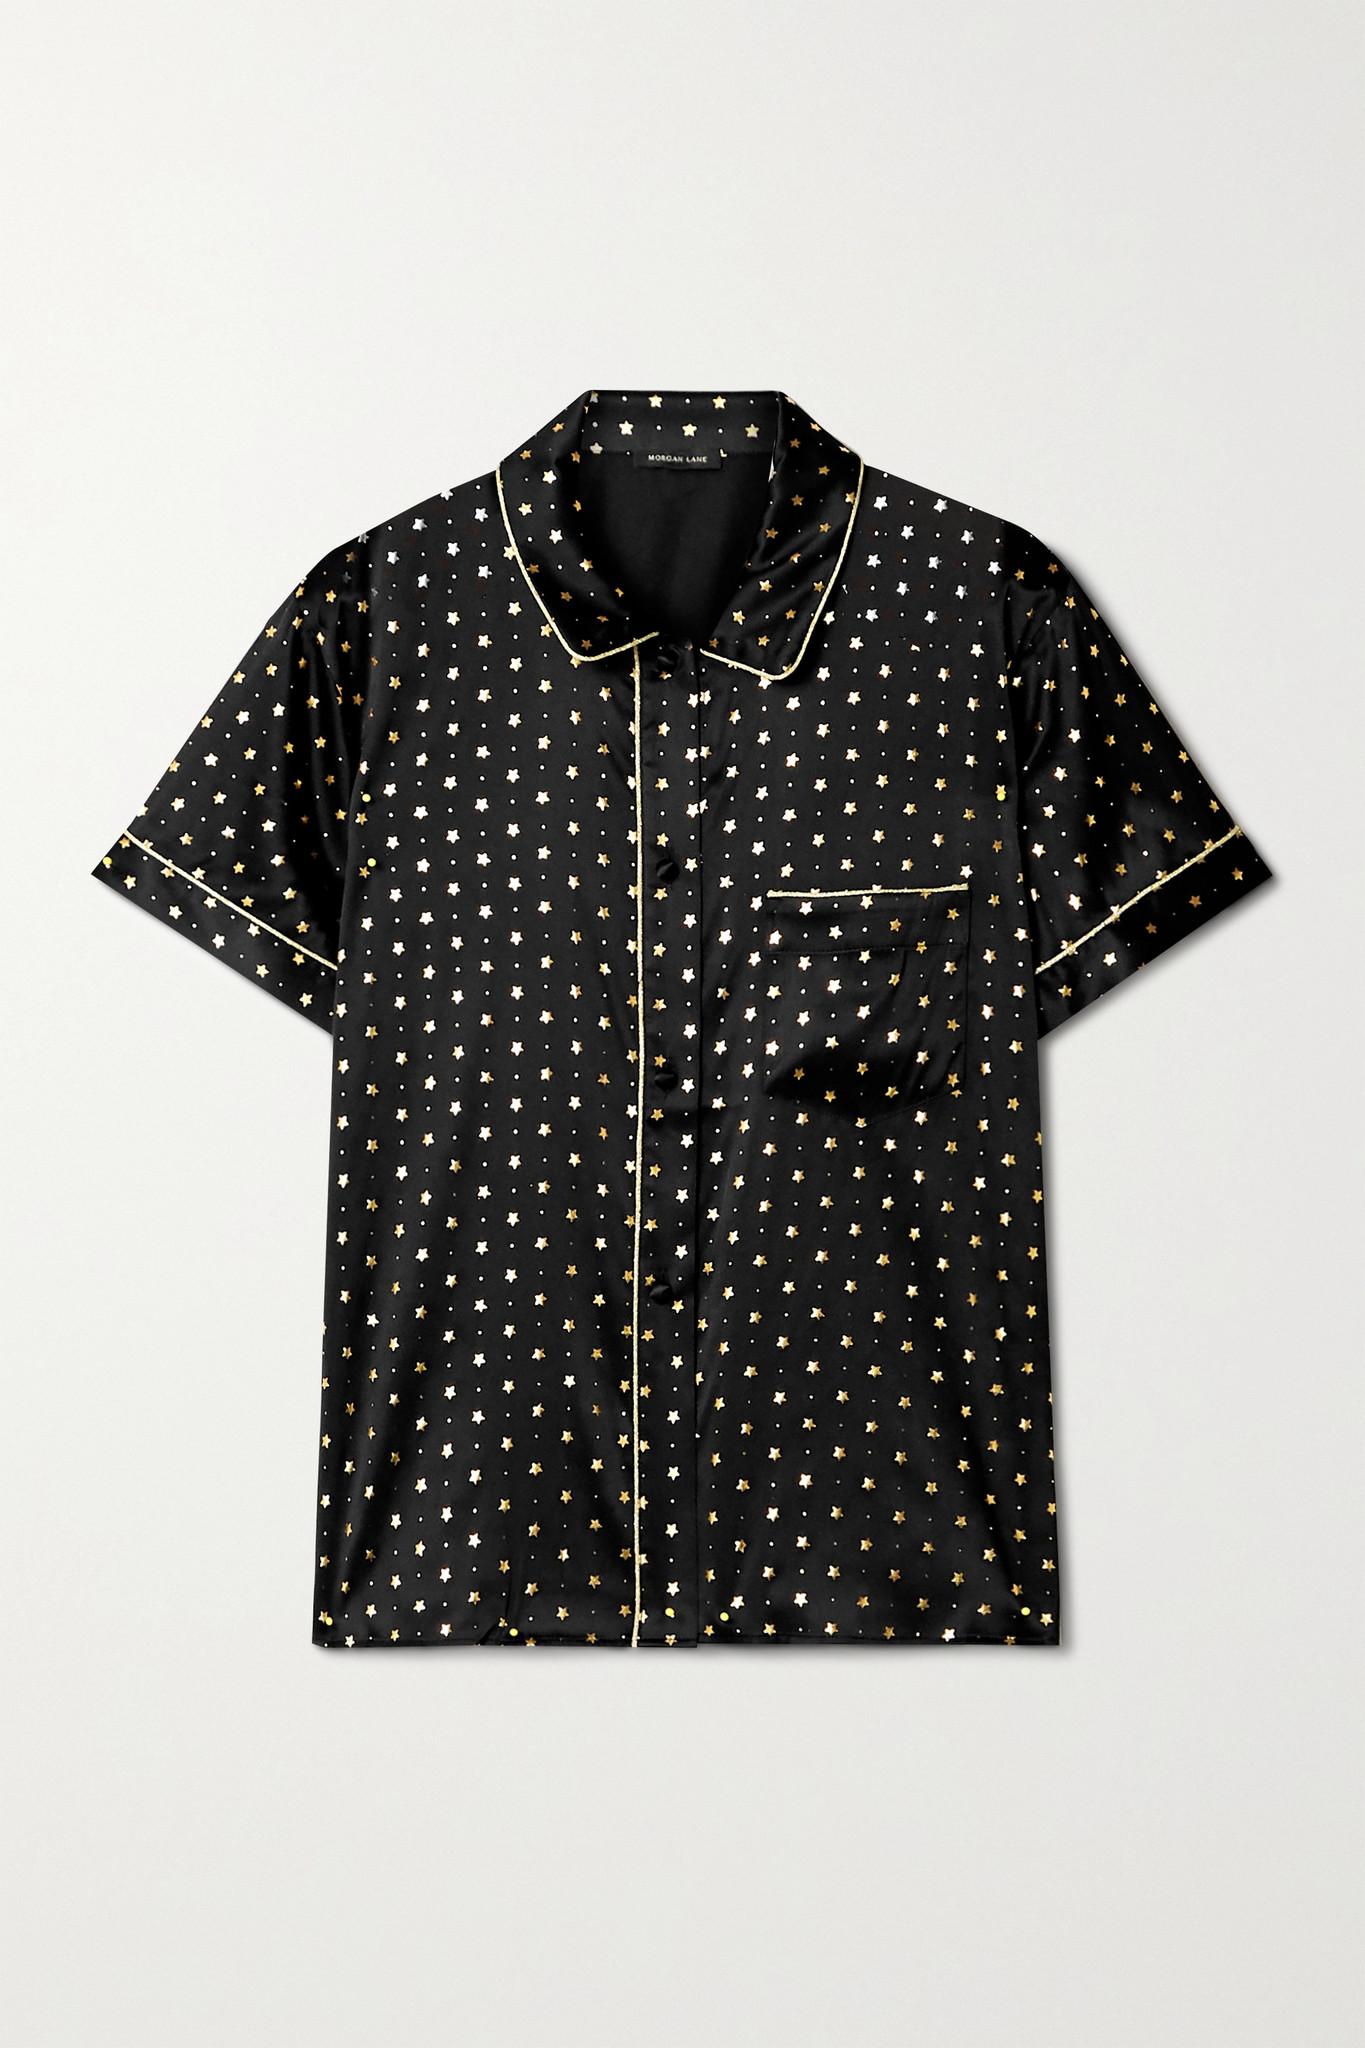 MORGAN LANE - Tami Metallic-trimmed Printed Silk-blend Satin Pajama Shirt - Black - x small